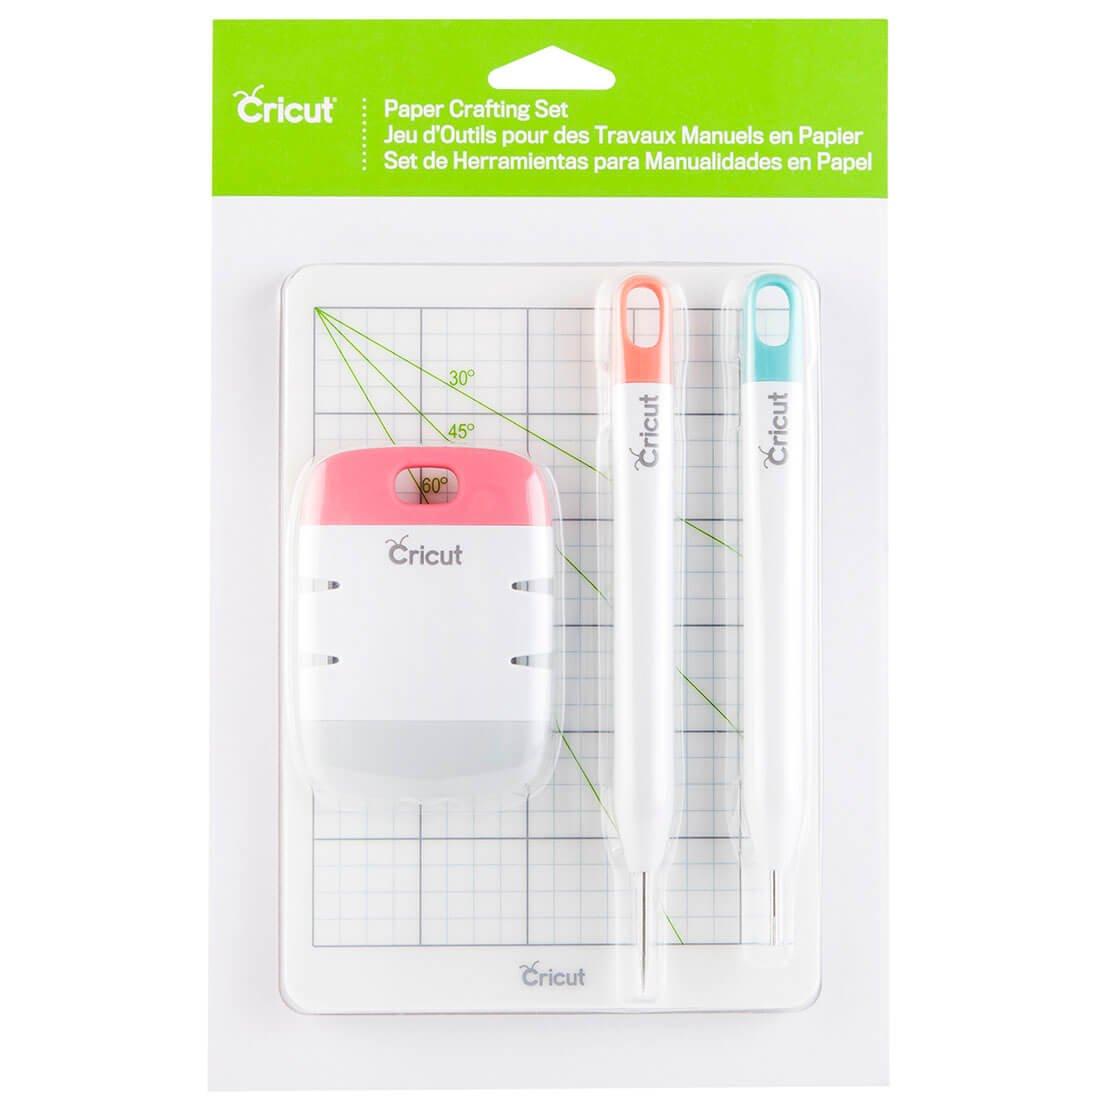 Cricut Paper Crafting Set